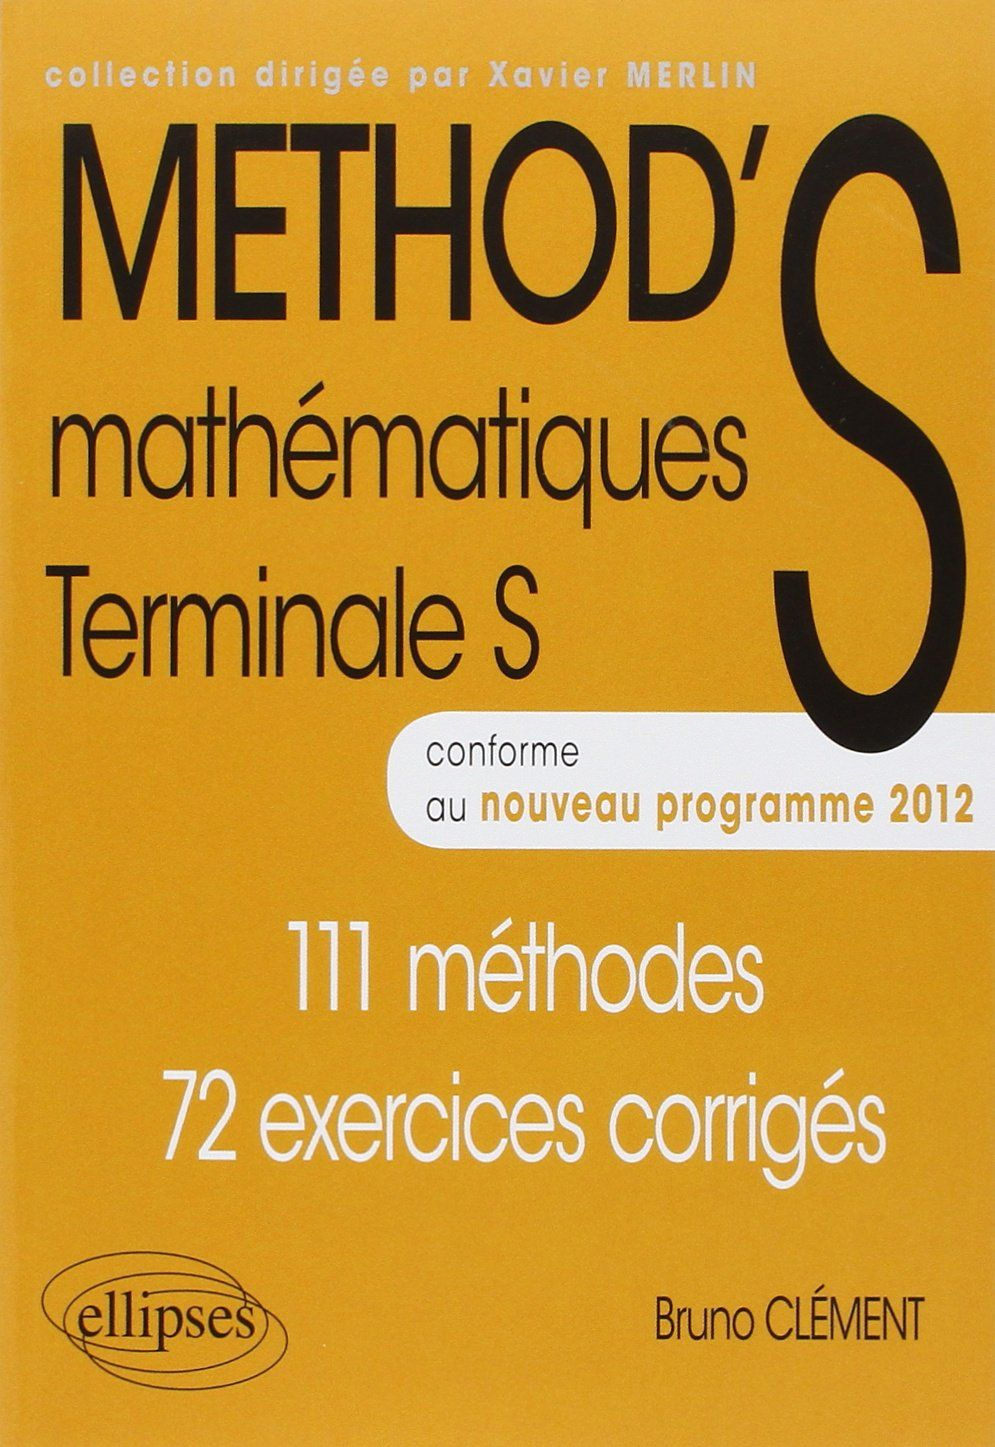 Programme De Maths Terminale S : programme, maths, terminale, Method's, Mathématiques, Terminale, Ellipses,, Company, Logos,, Logo,